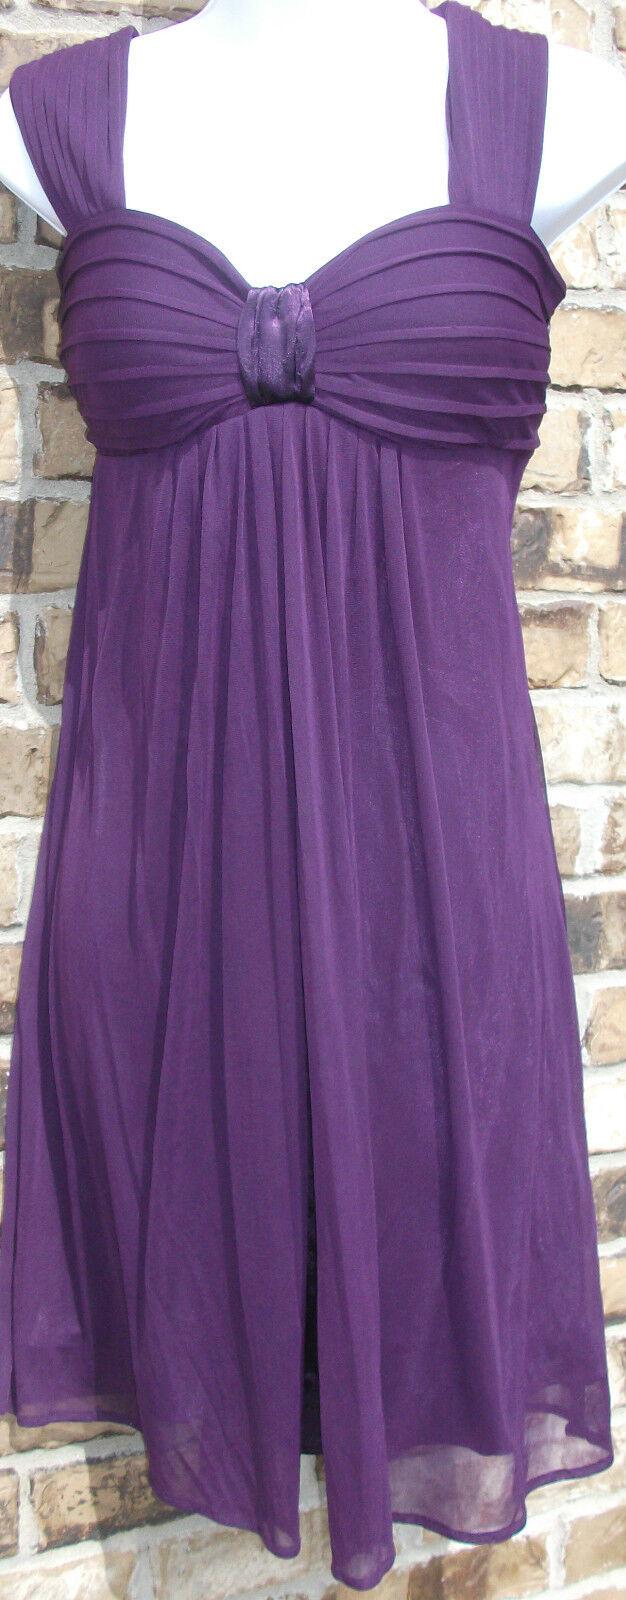 NWOT Genuine S.L. FASHIONS sleeveless purple mini party dress, size 8